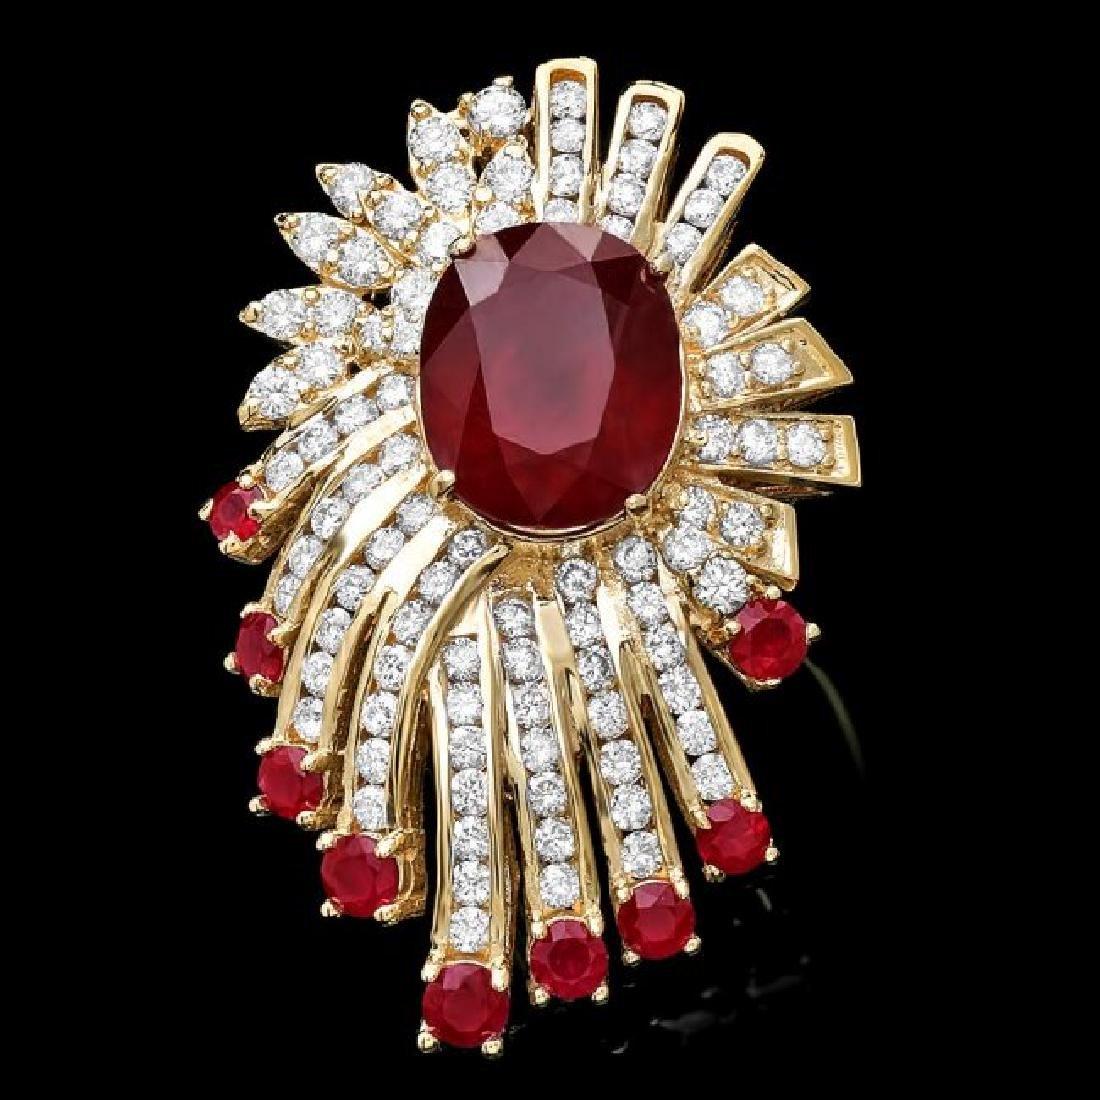 14k Yellow Gold 10ct Ruby 3.70ct Diamond Ring - 2